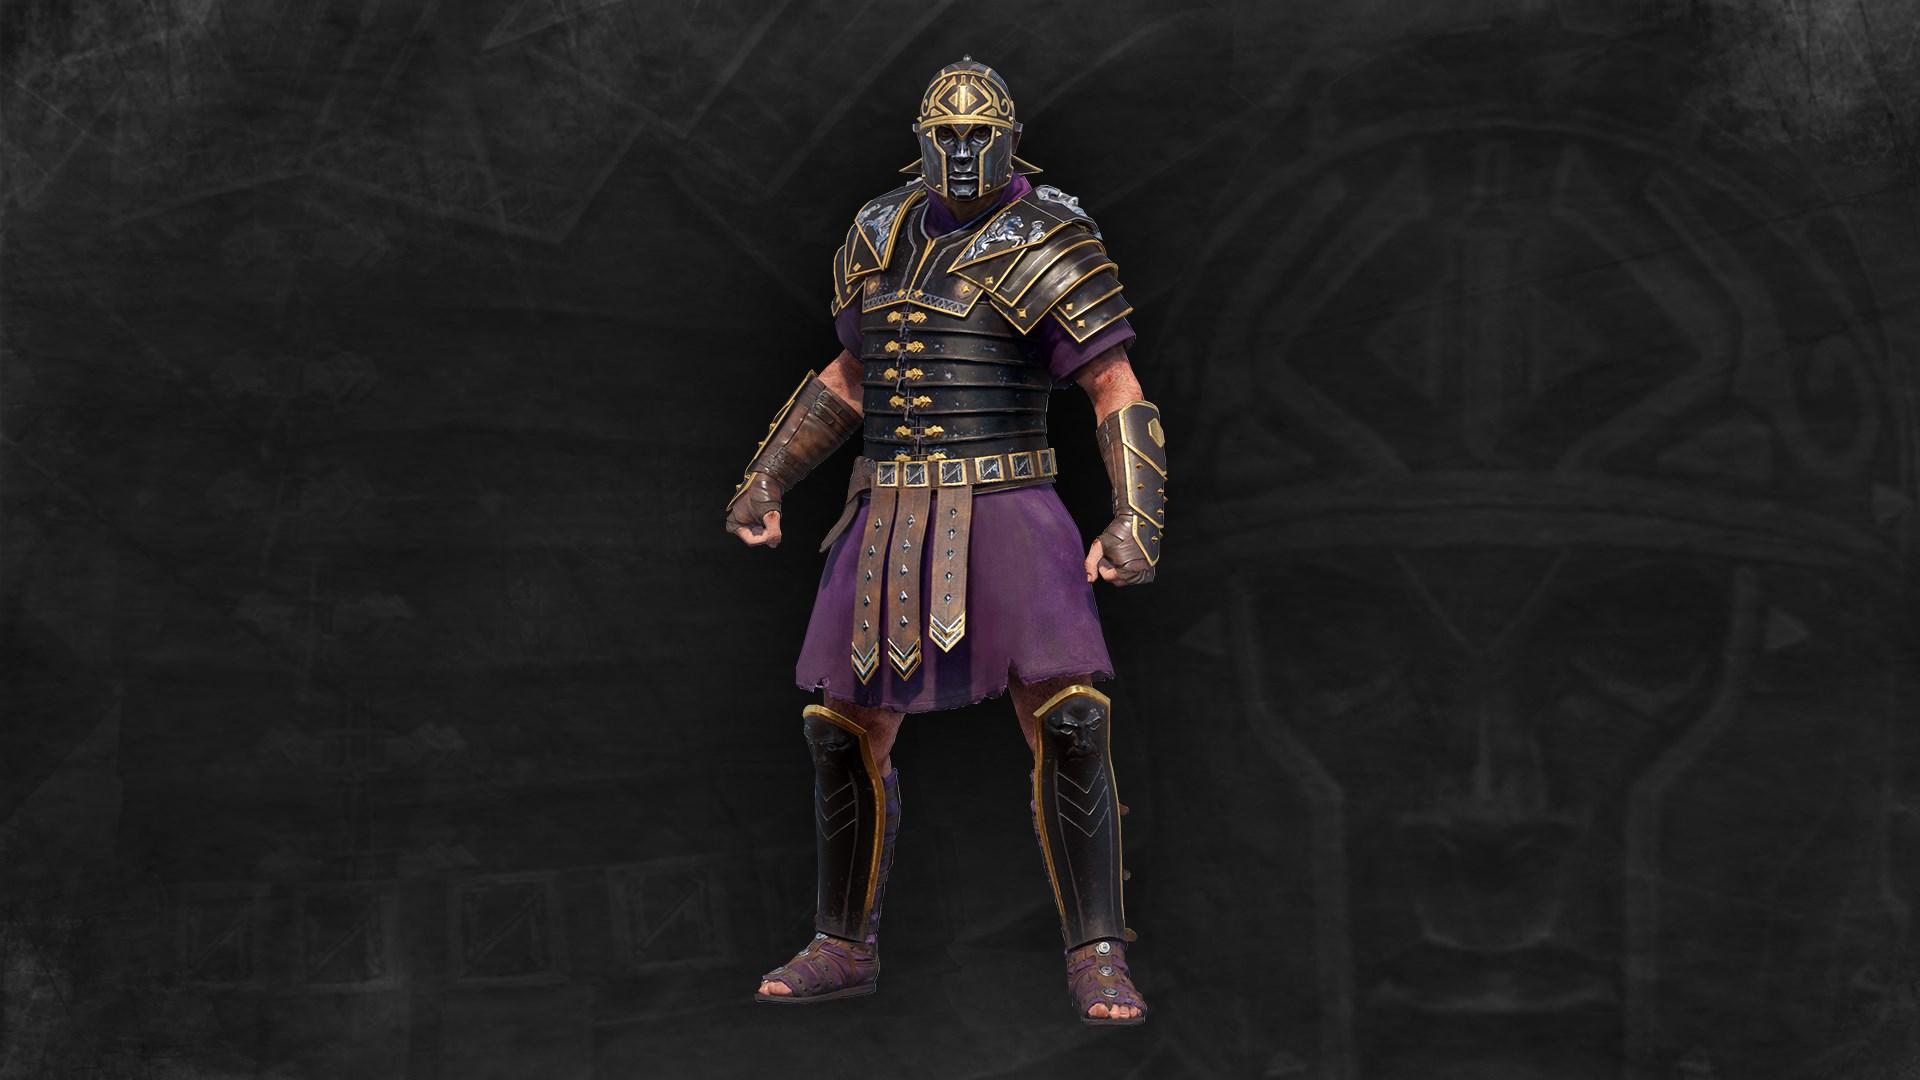 Gladiator-Skin: Prätorianer